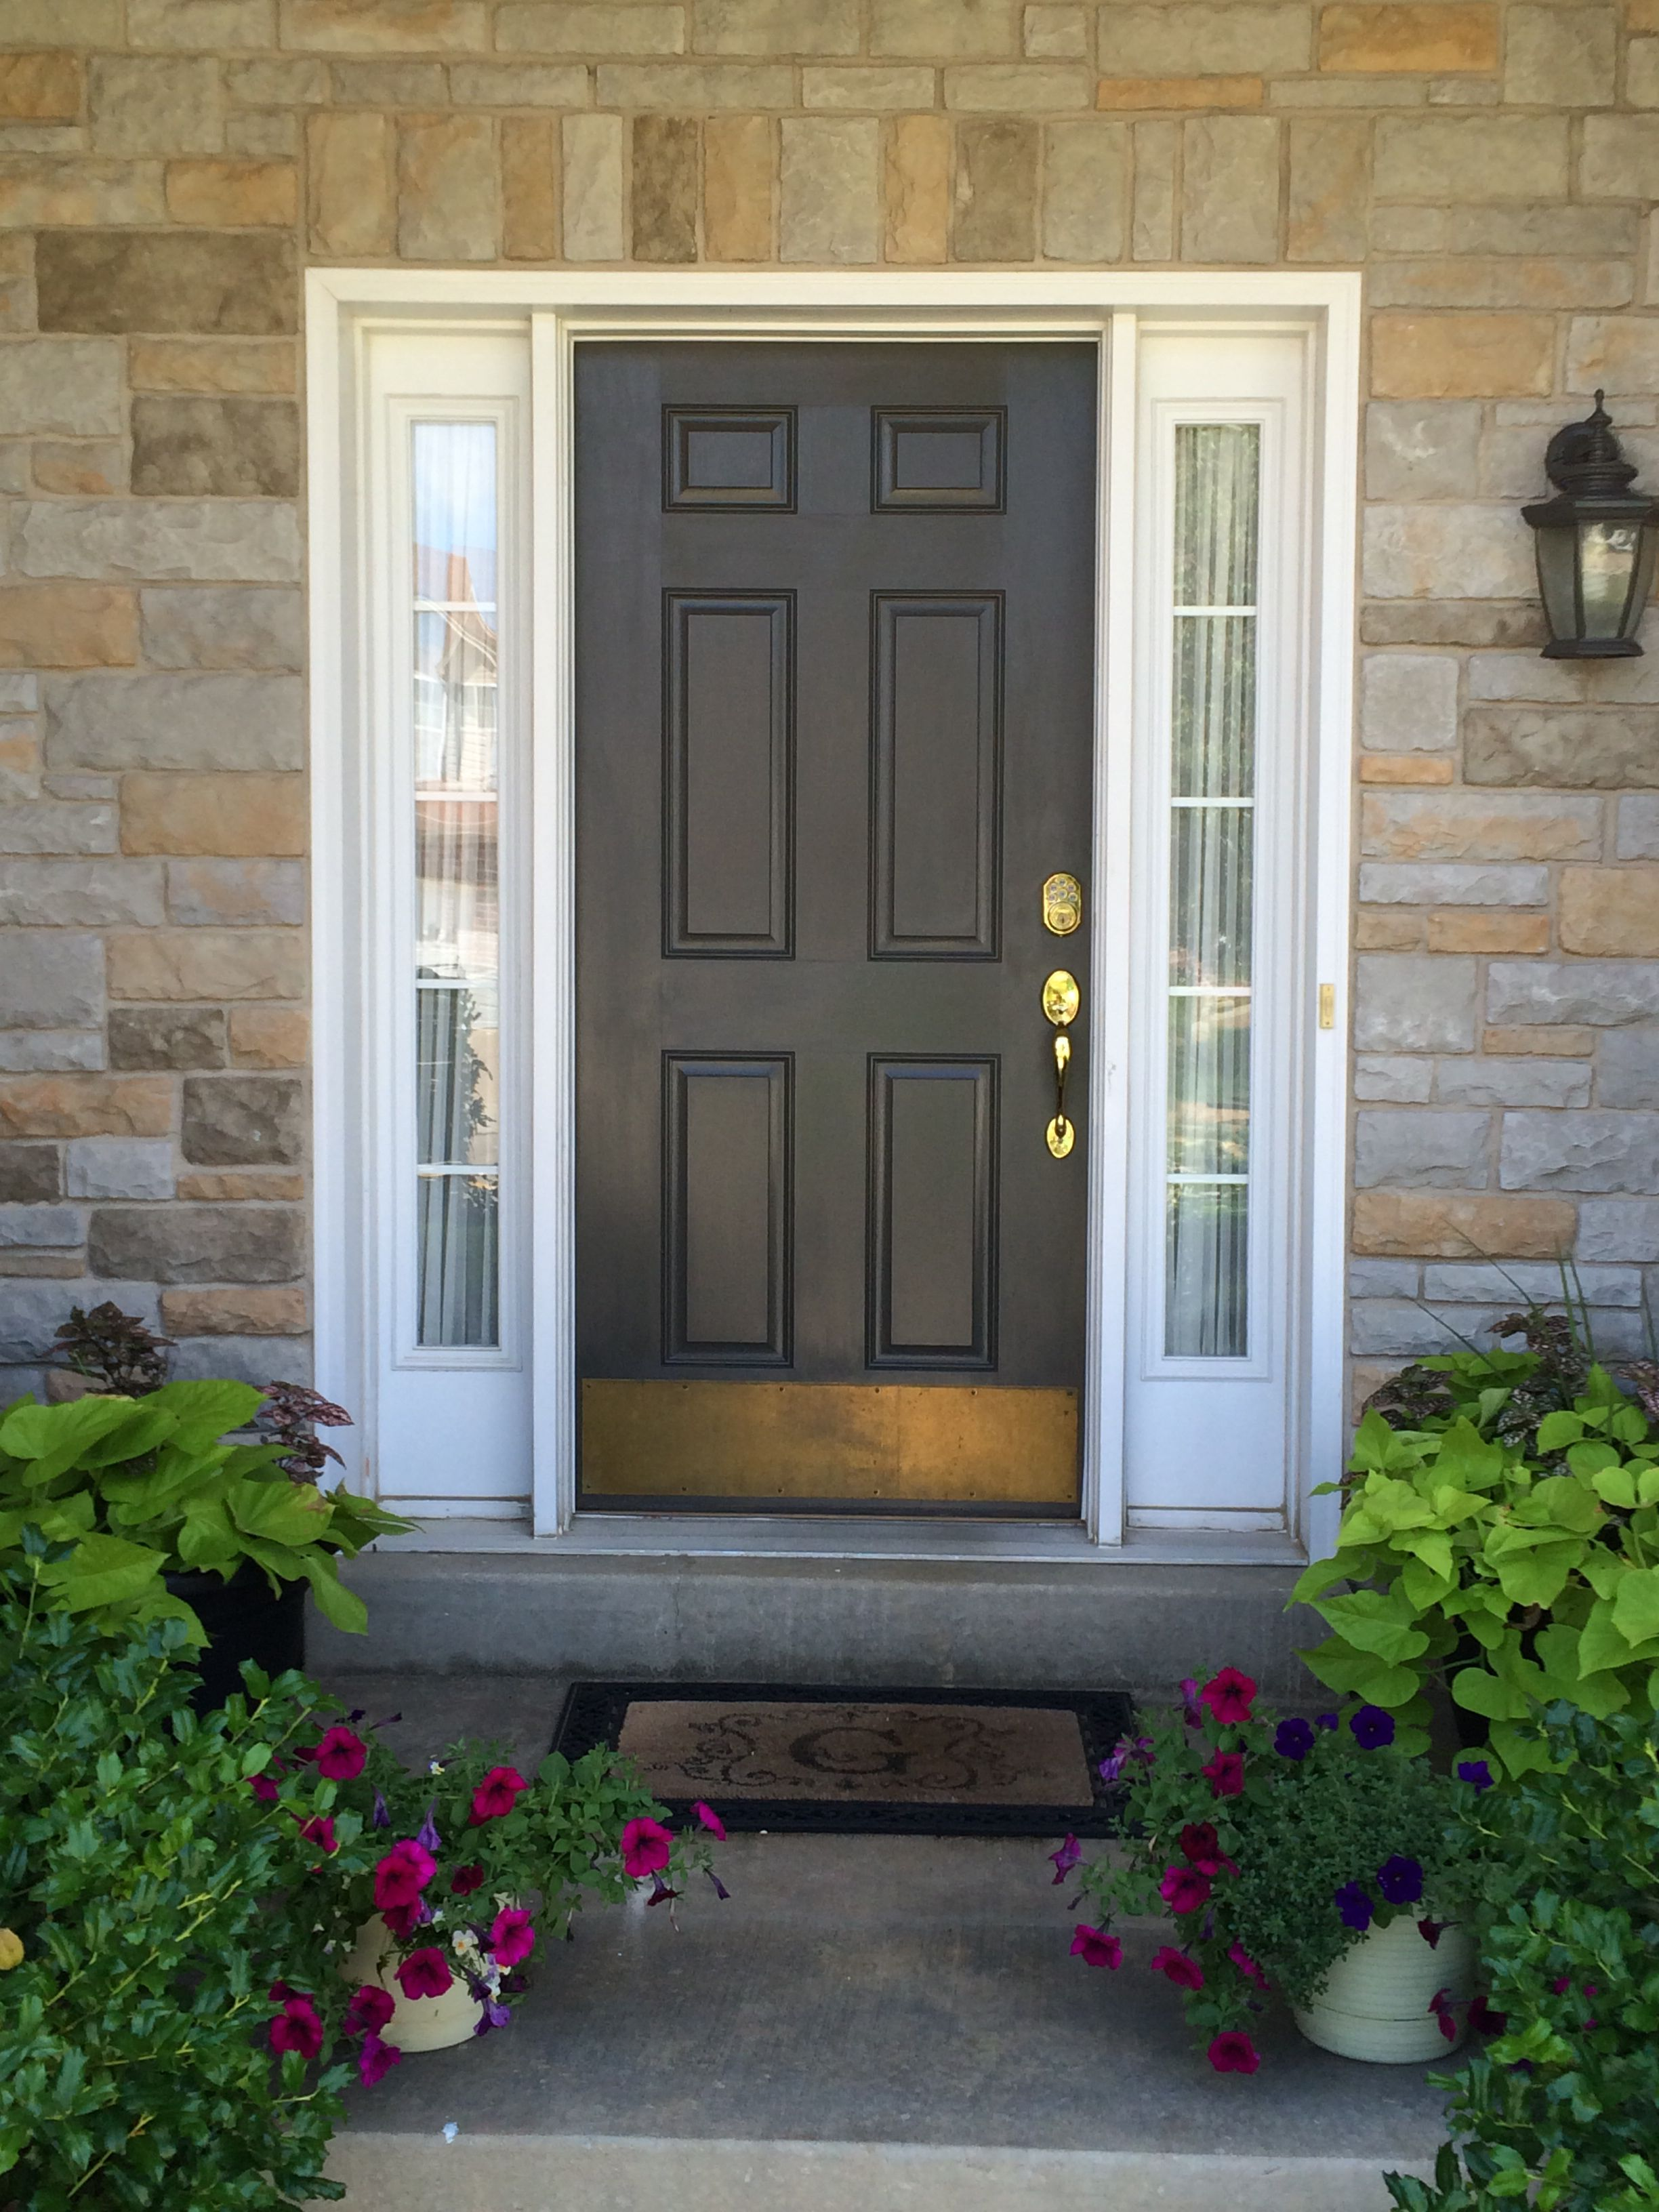 Front door and light painted sherwin williams urbane - Sherwin williams artichoke exterior ...